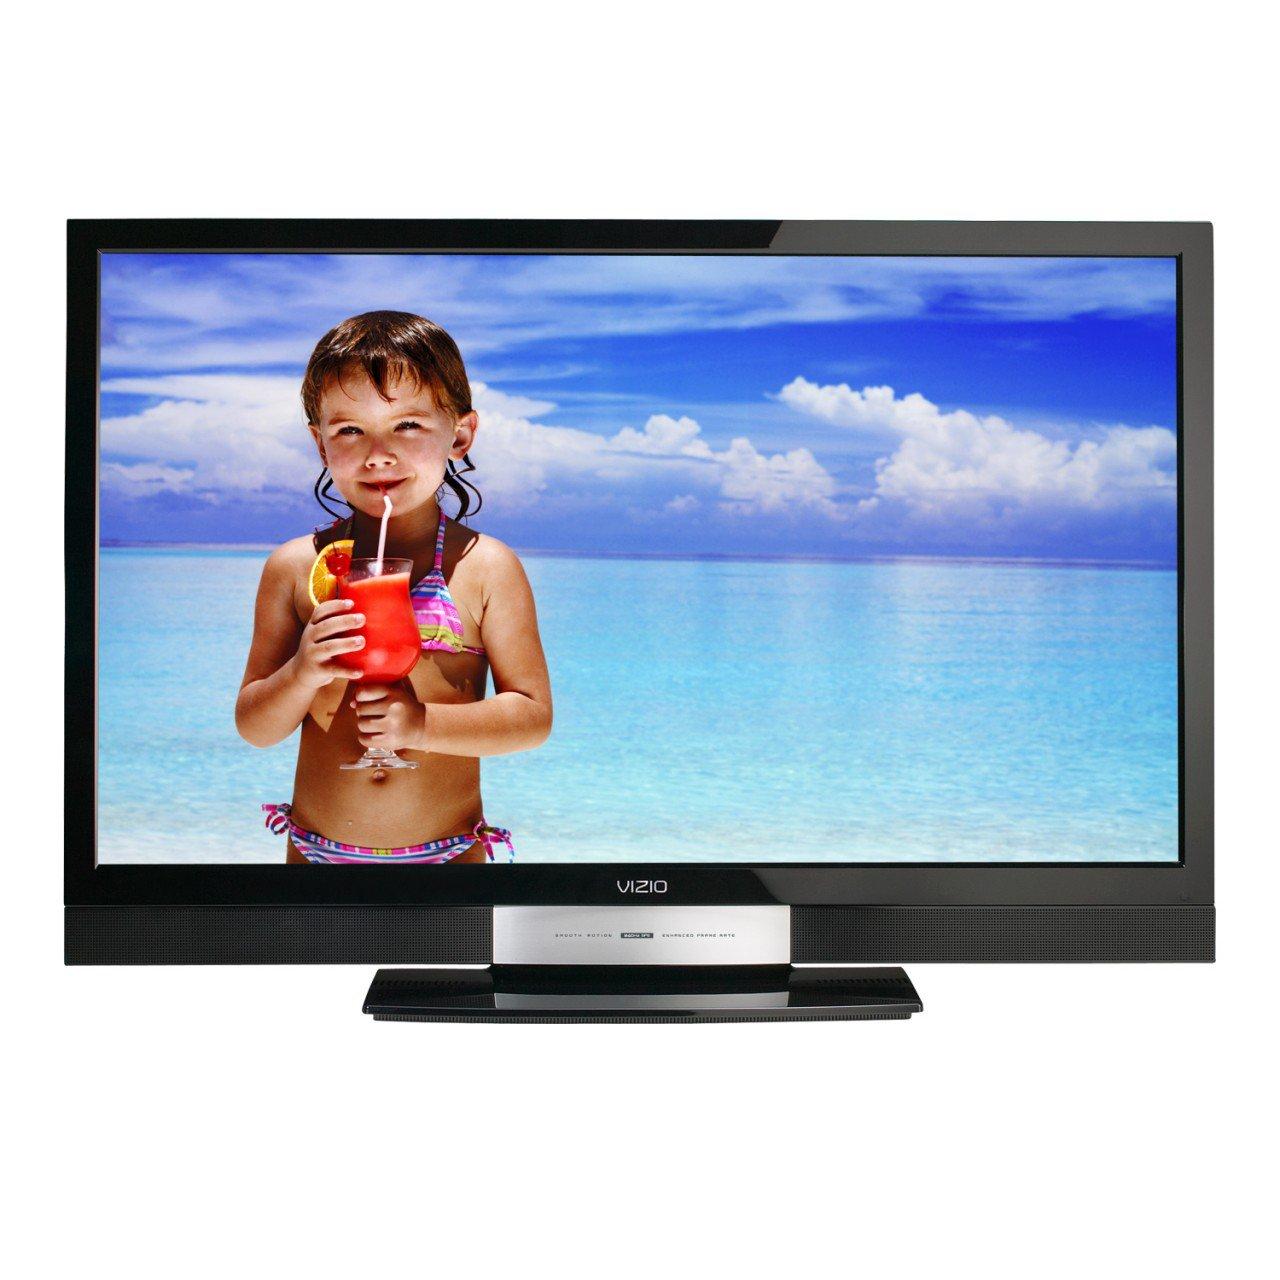 "Vizio 42"" SV421XVT 1080p 240Hz LCD HDTV"